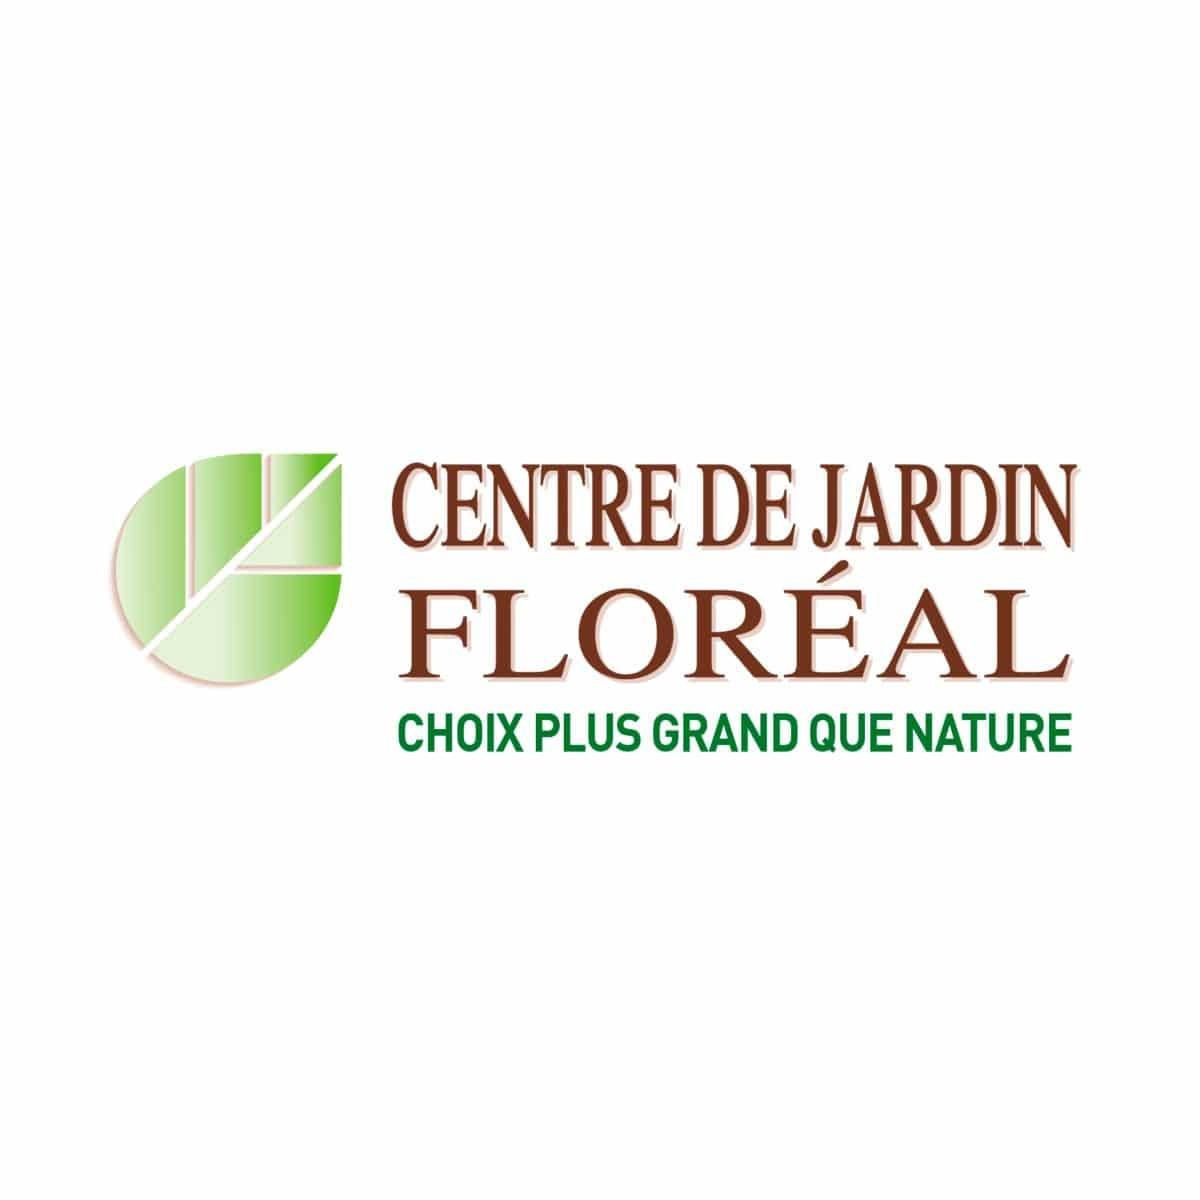 The Centre De Jardin Floréal Store for Gardening And Landscaping